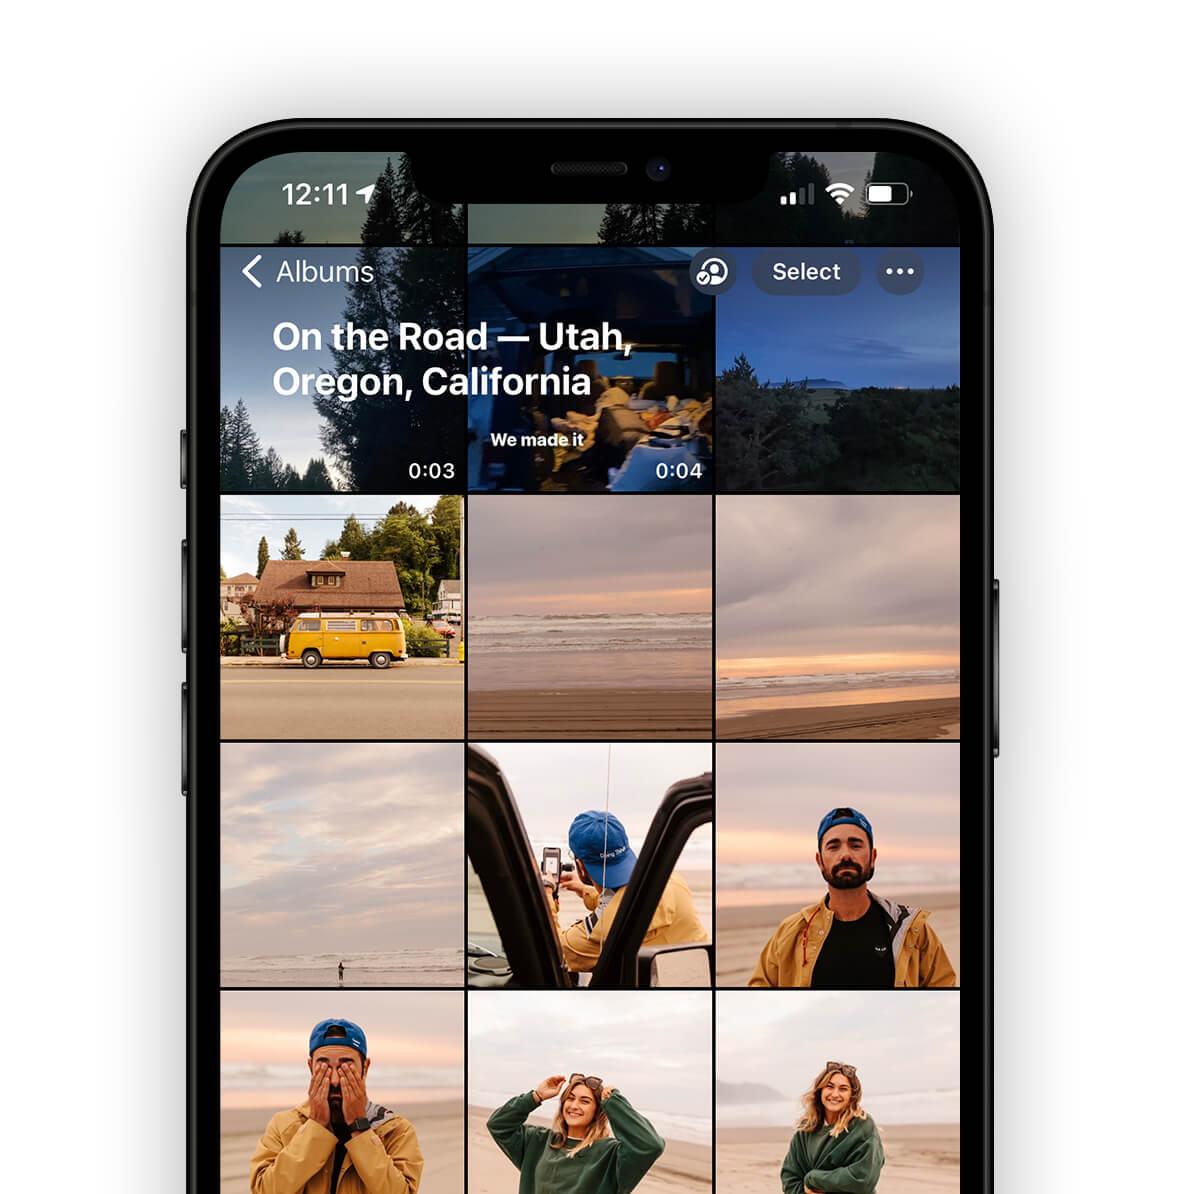 iPhone album of photos by Brandon Lopez